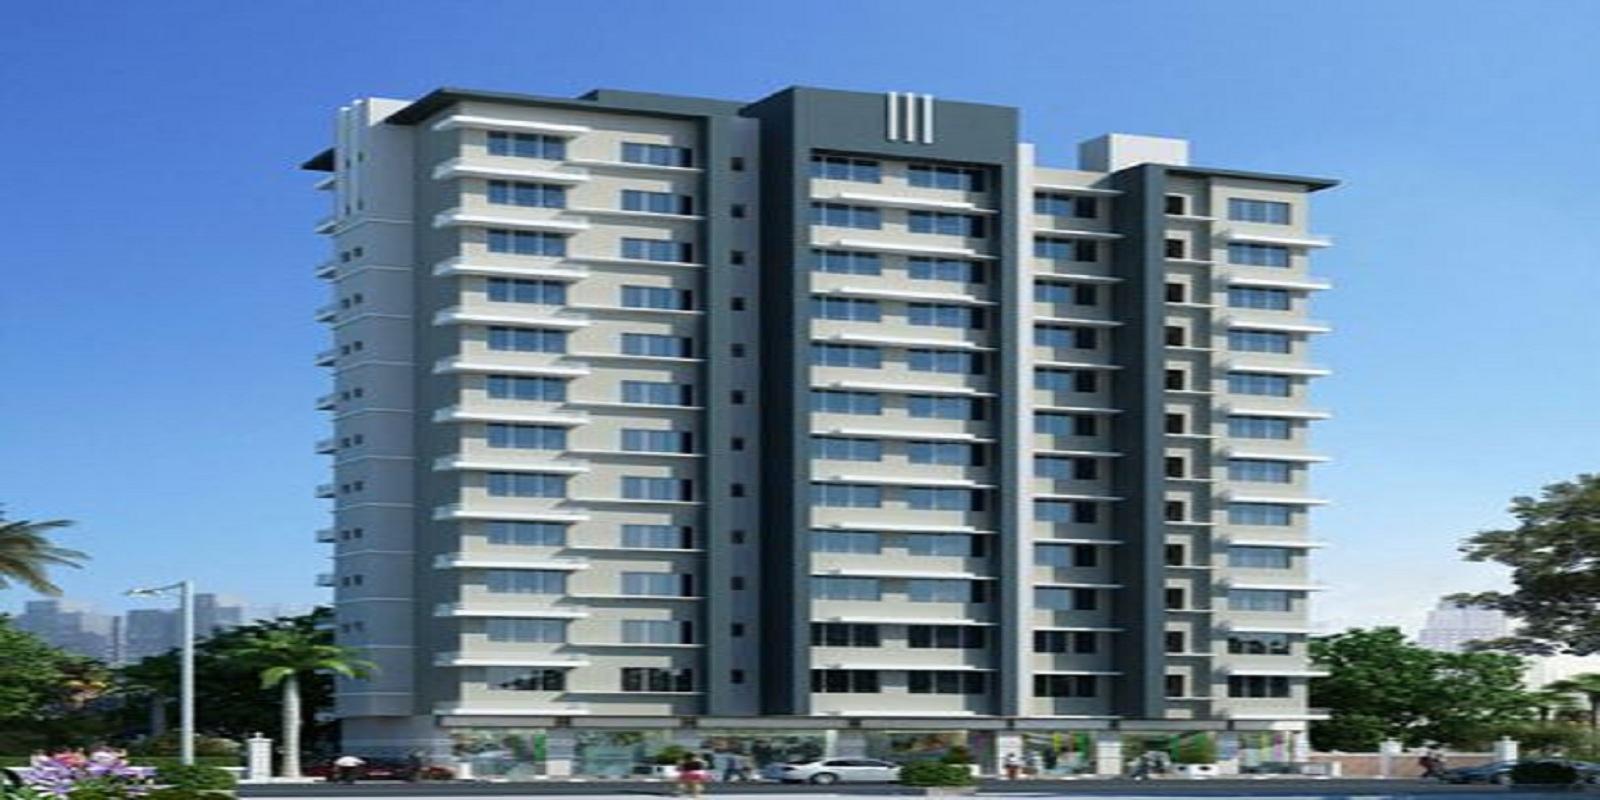 navkar ashray project project large image1